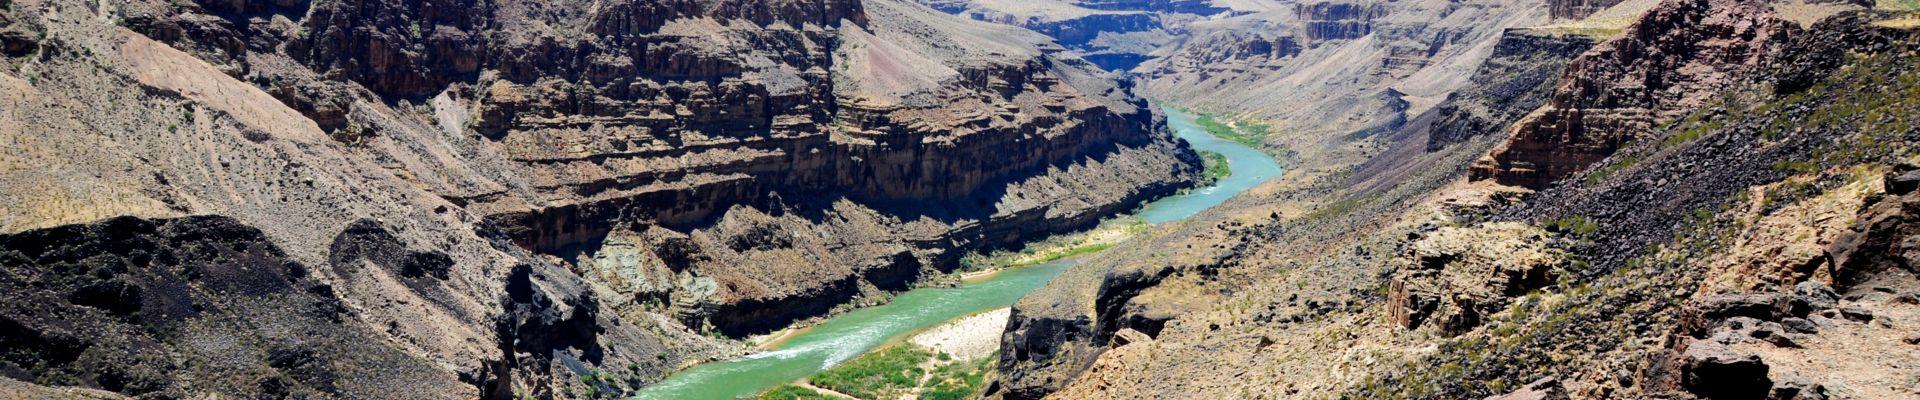 The blue Colorado River cuts through stark Grand Canyon walls.